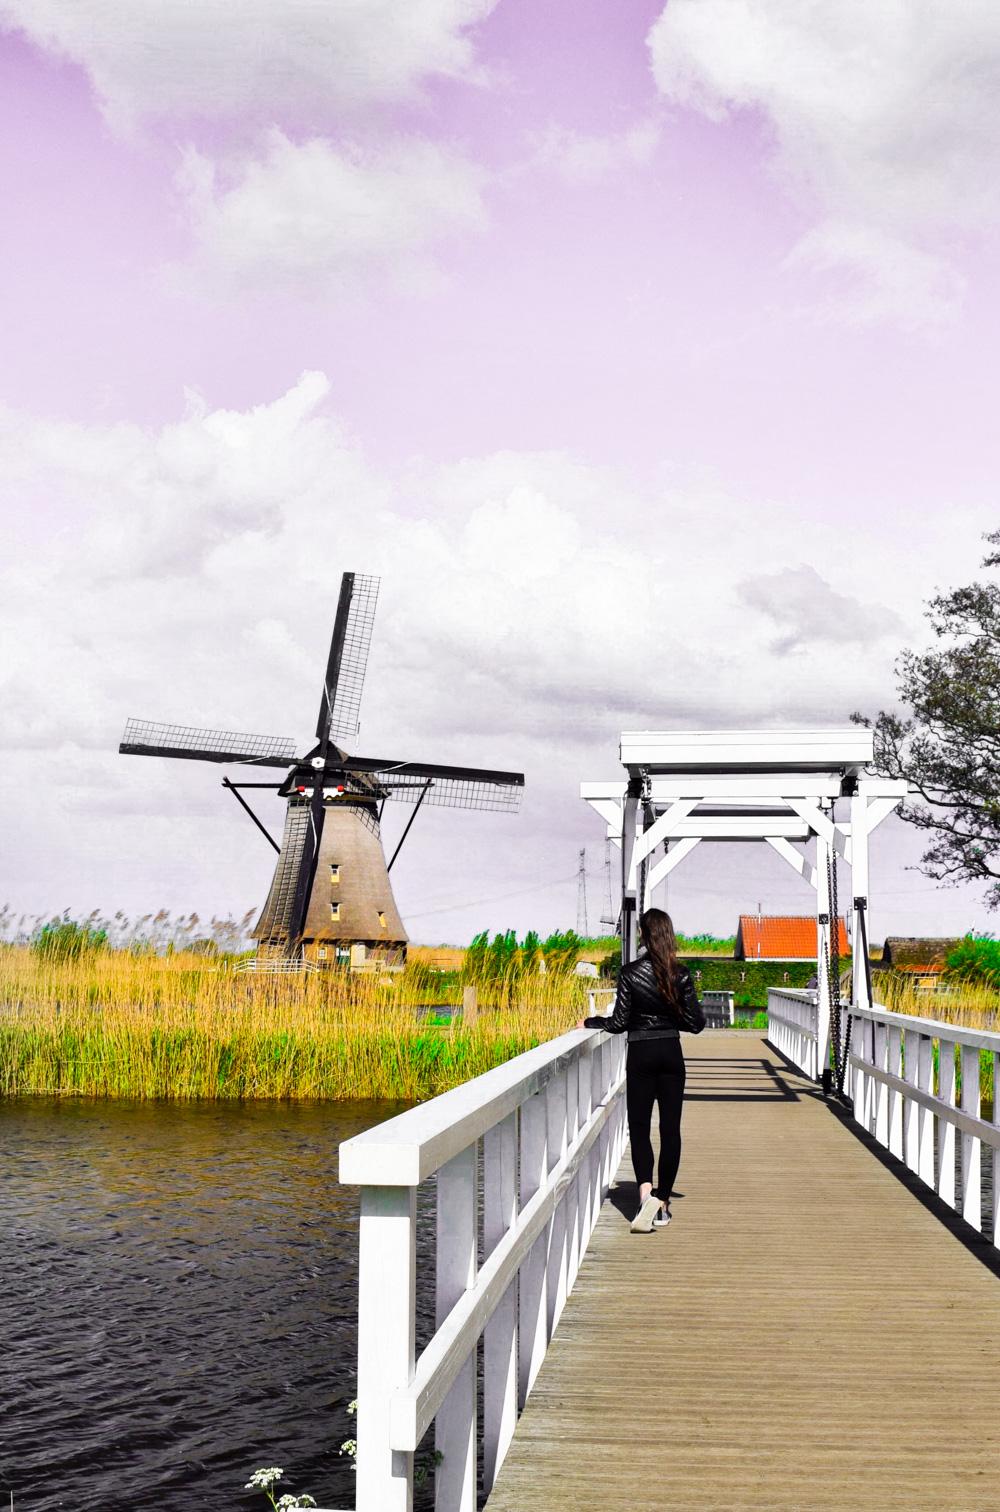 Amsterdam to Kinderdijk